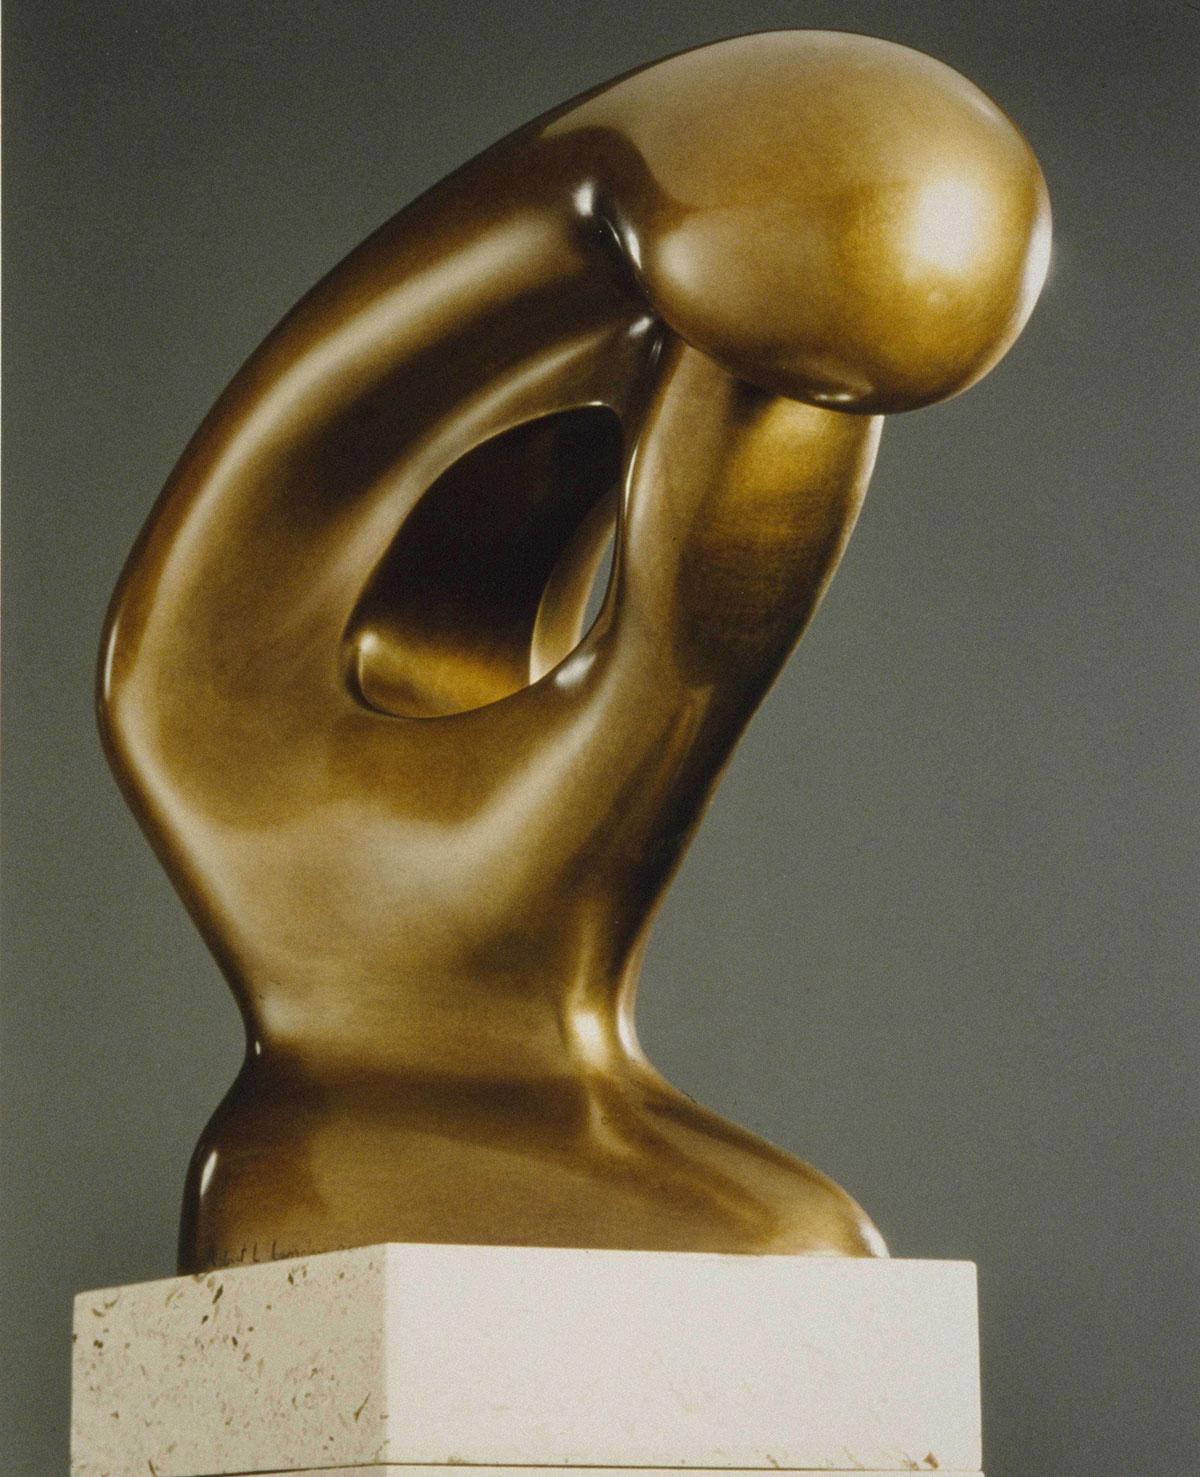 MATERNAL CONTEMPLATION (Of Rodin\'s Thinker)